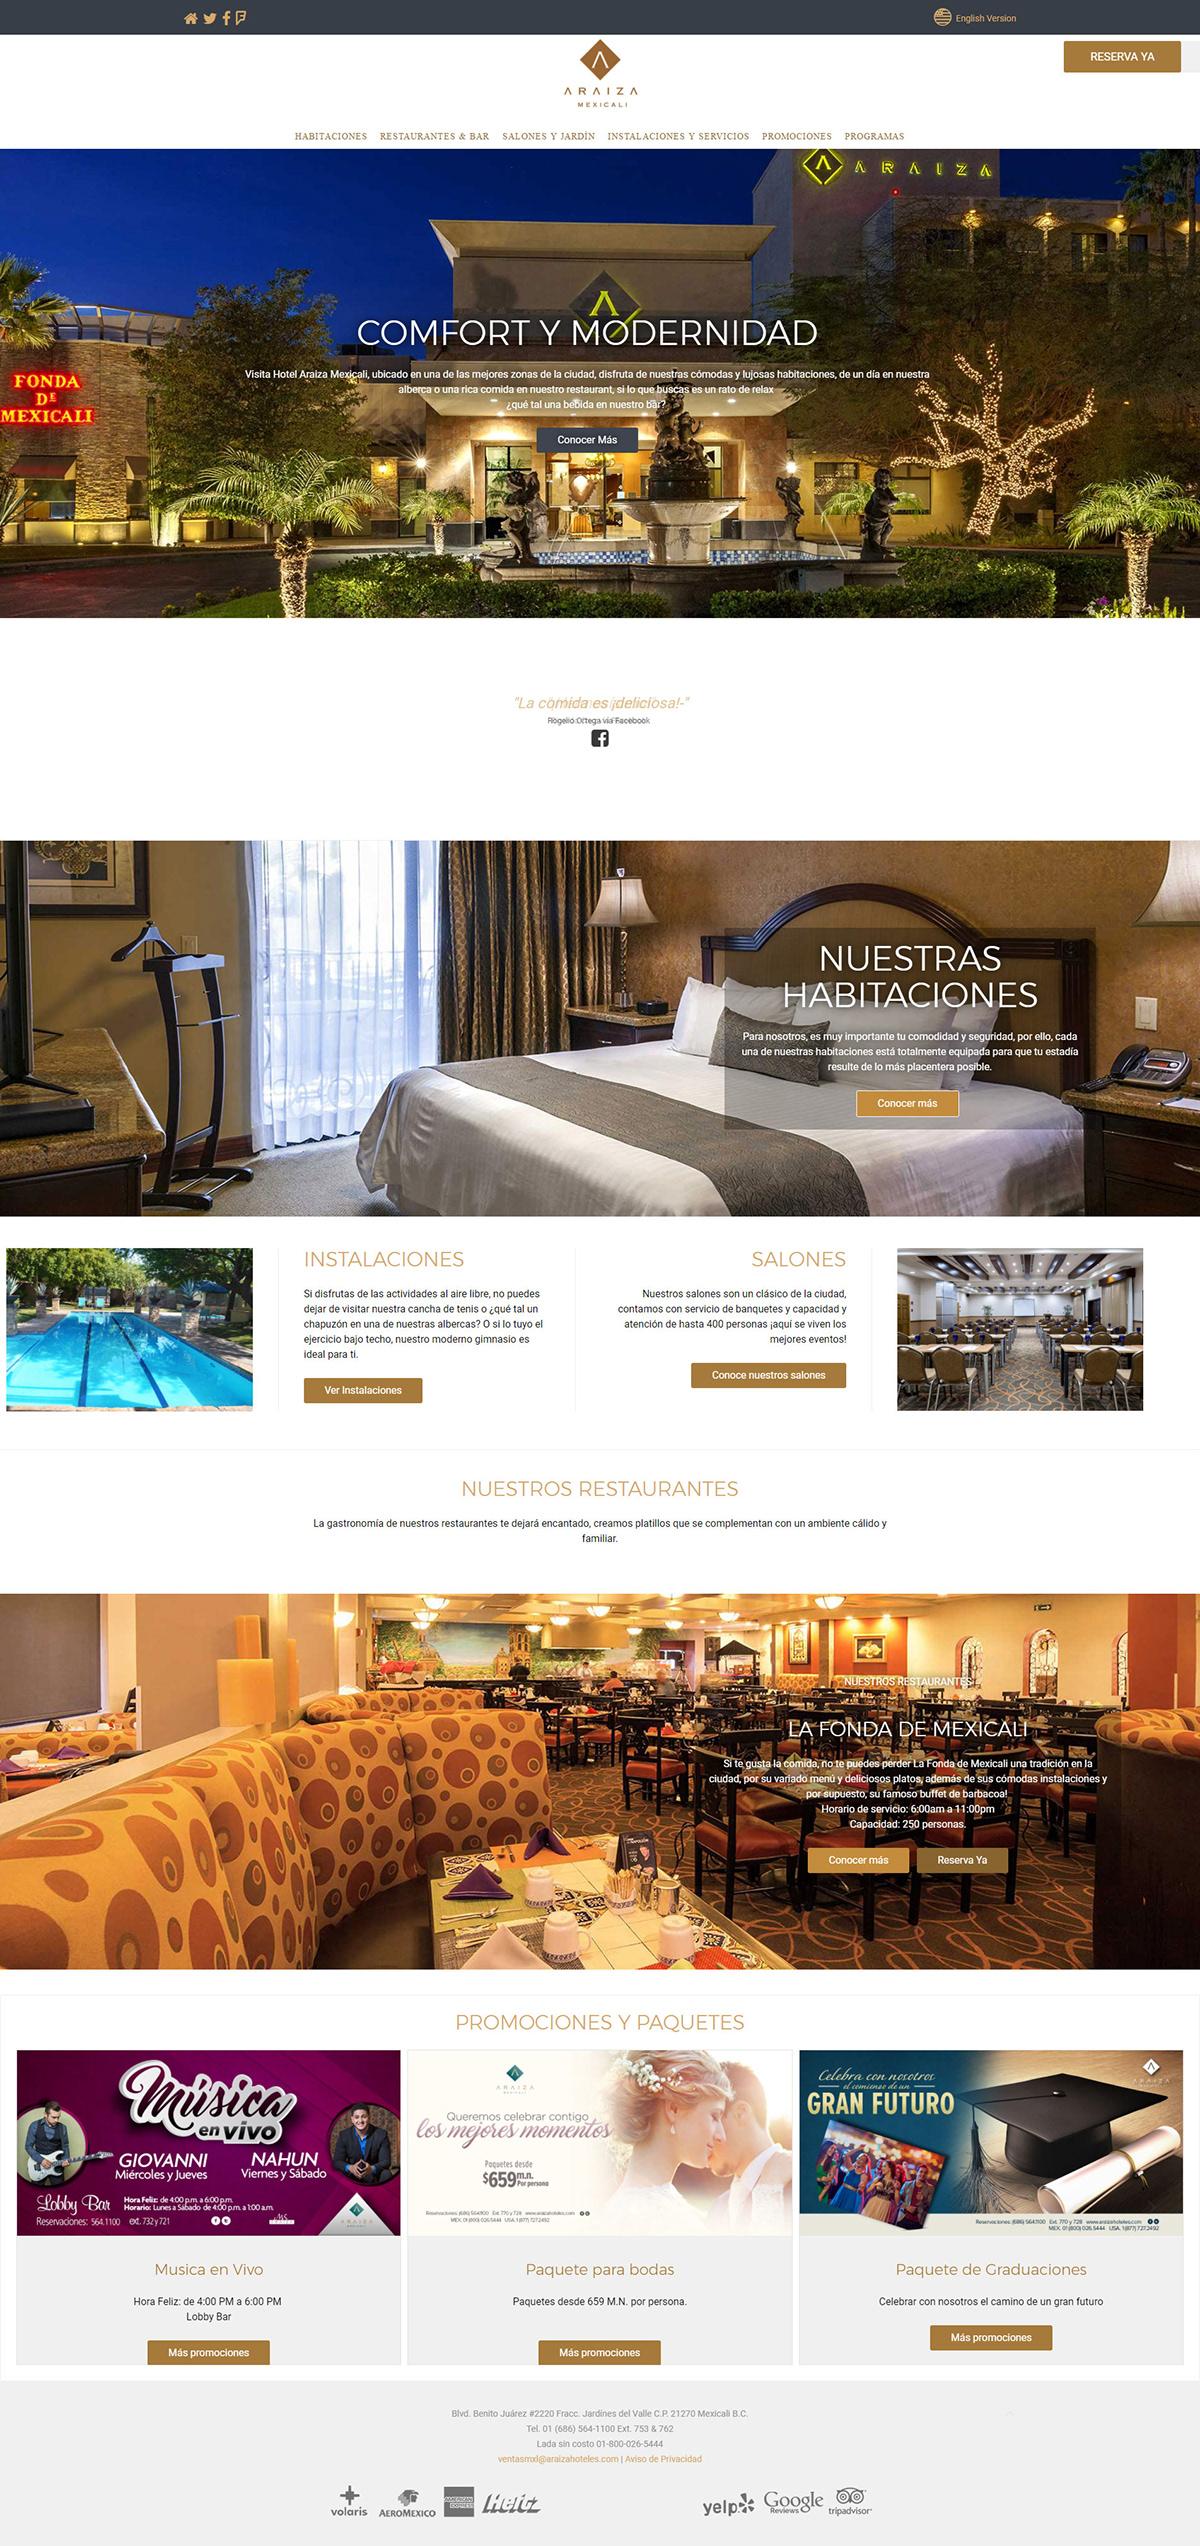 Web Design  Travel hotel tourism